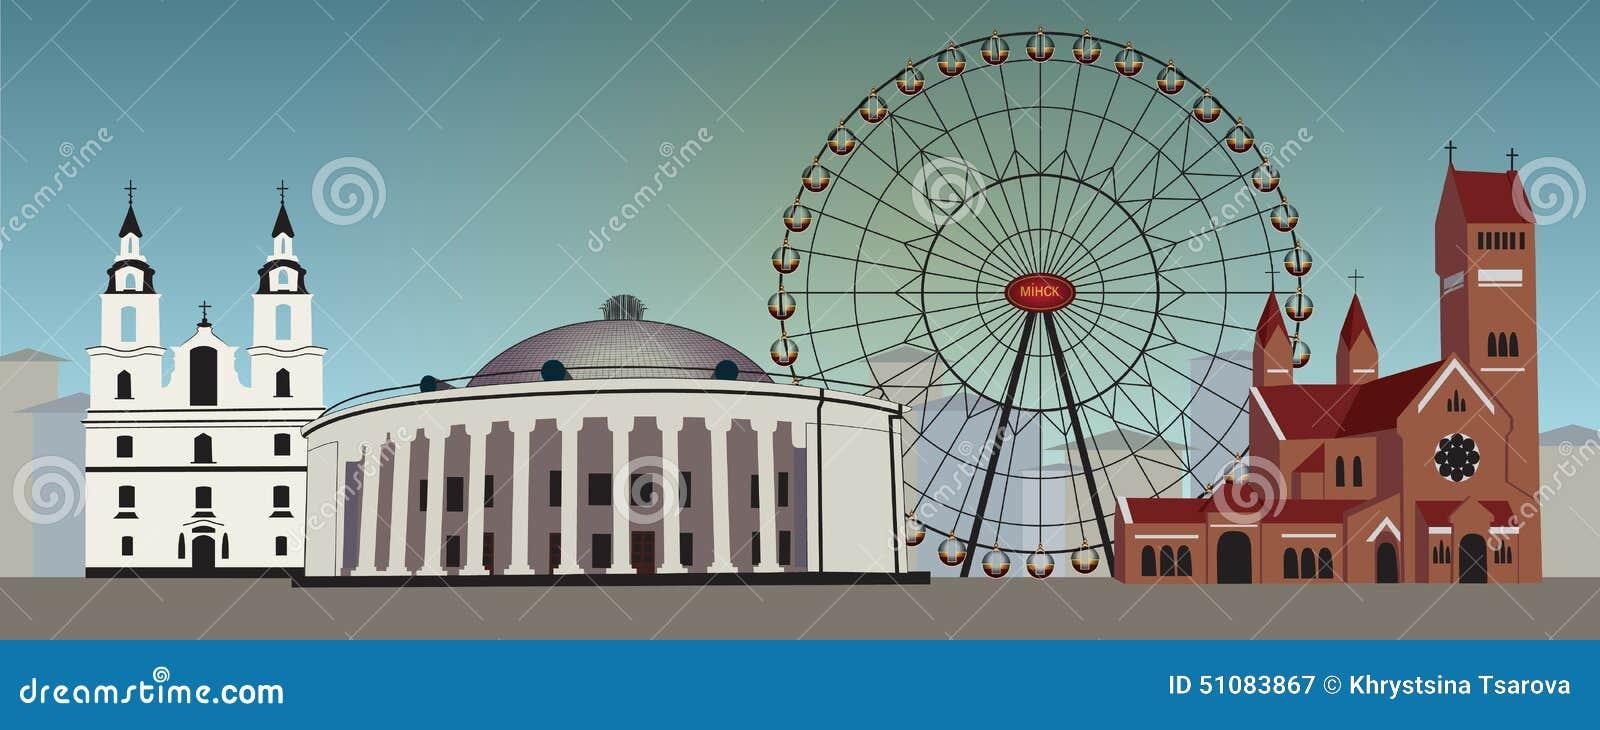 Dagelijkse architectuur van stad Minsk